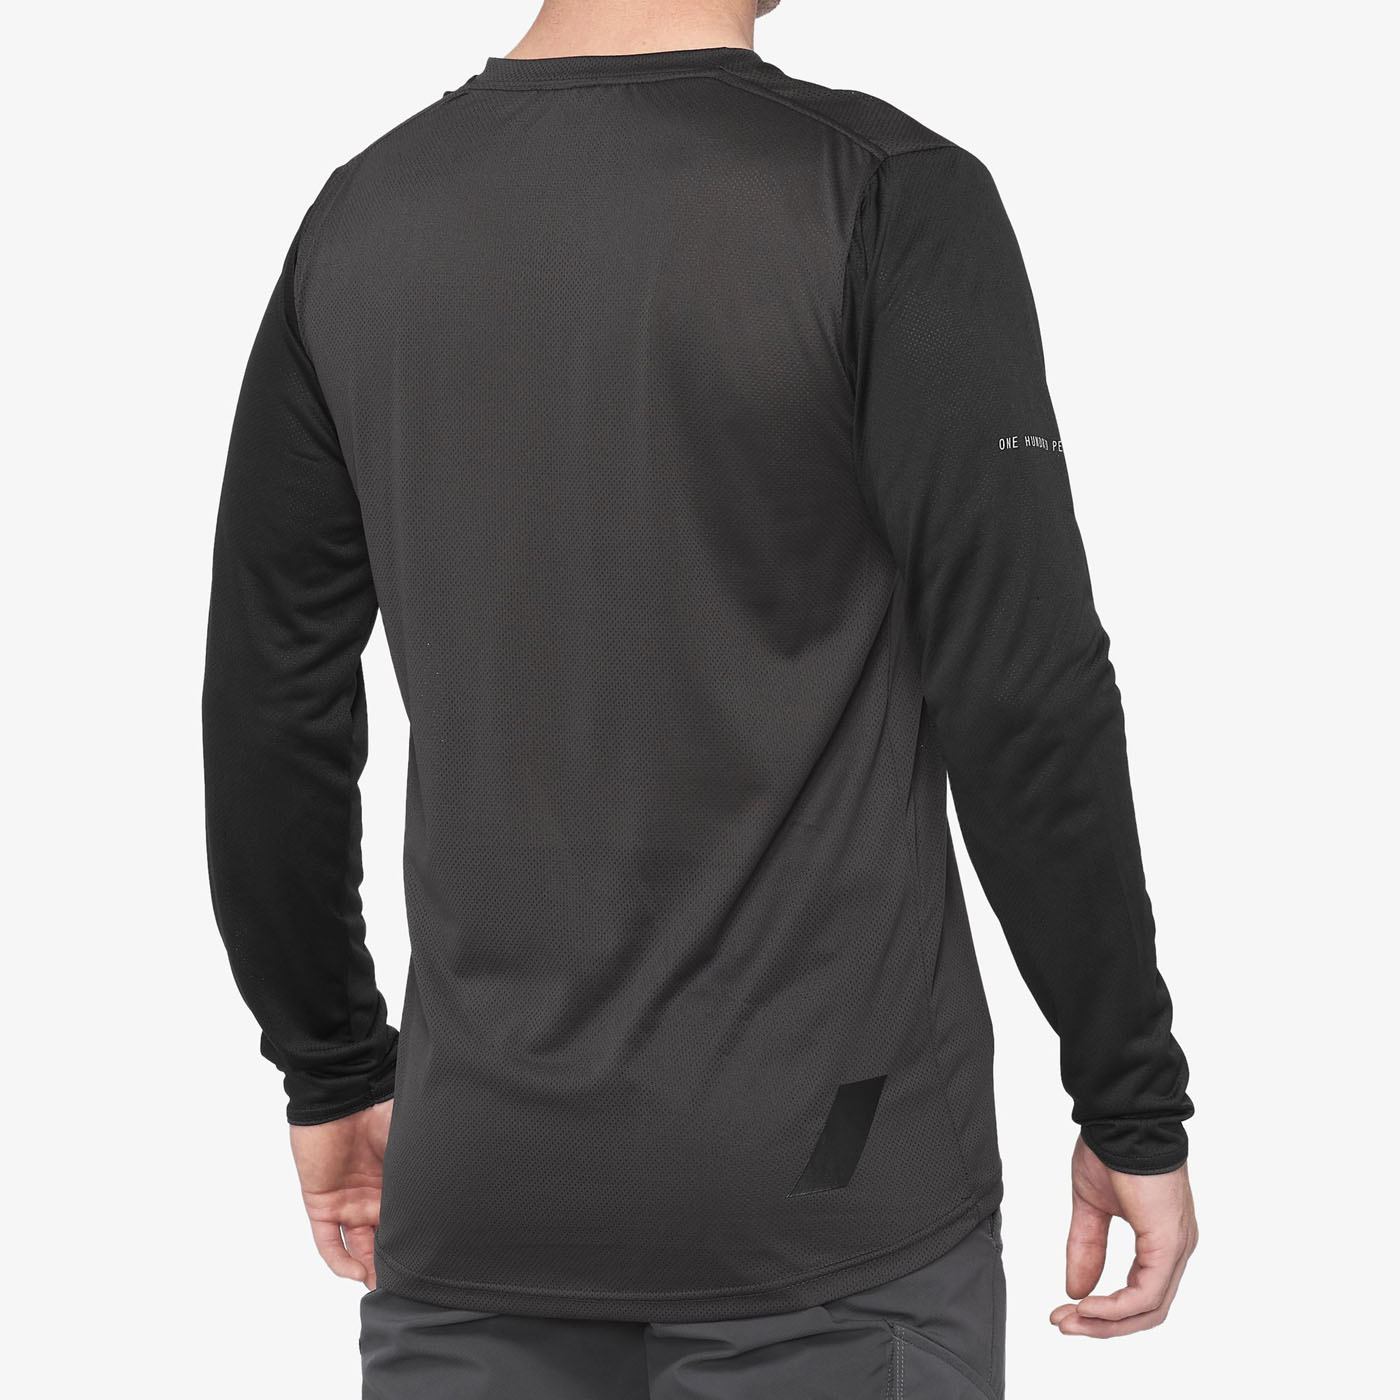 Imagen de 100% Ridecamp Long Sleeve Jersey - Black / Charcoal